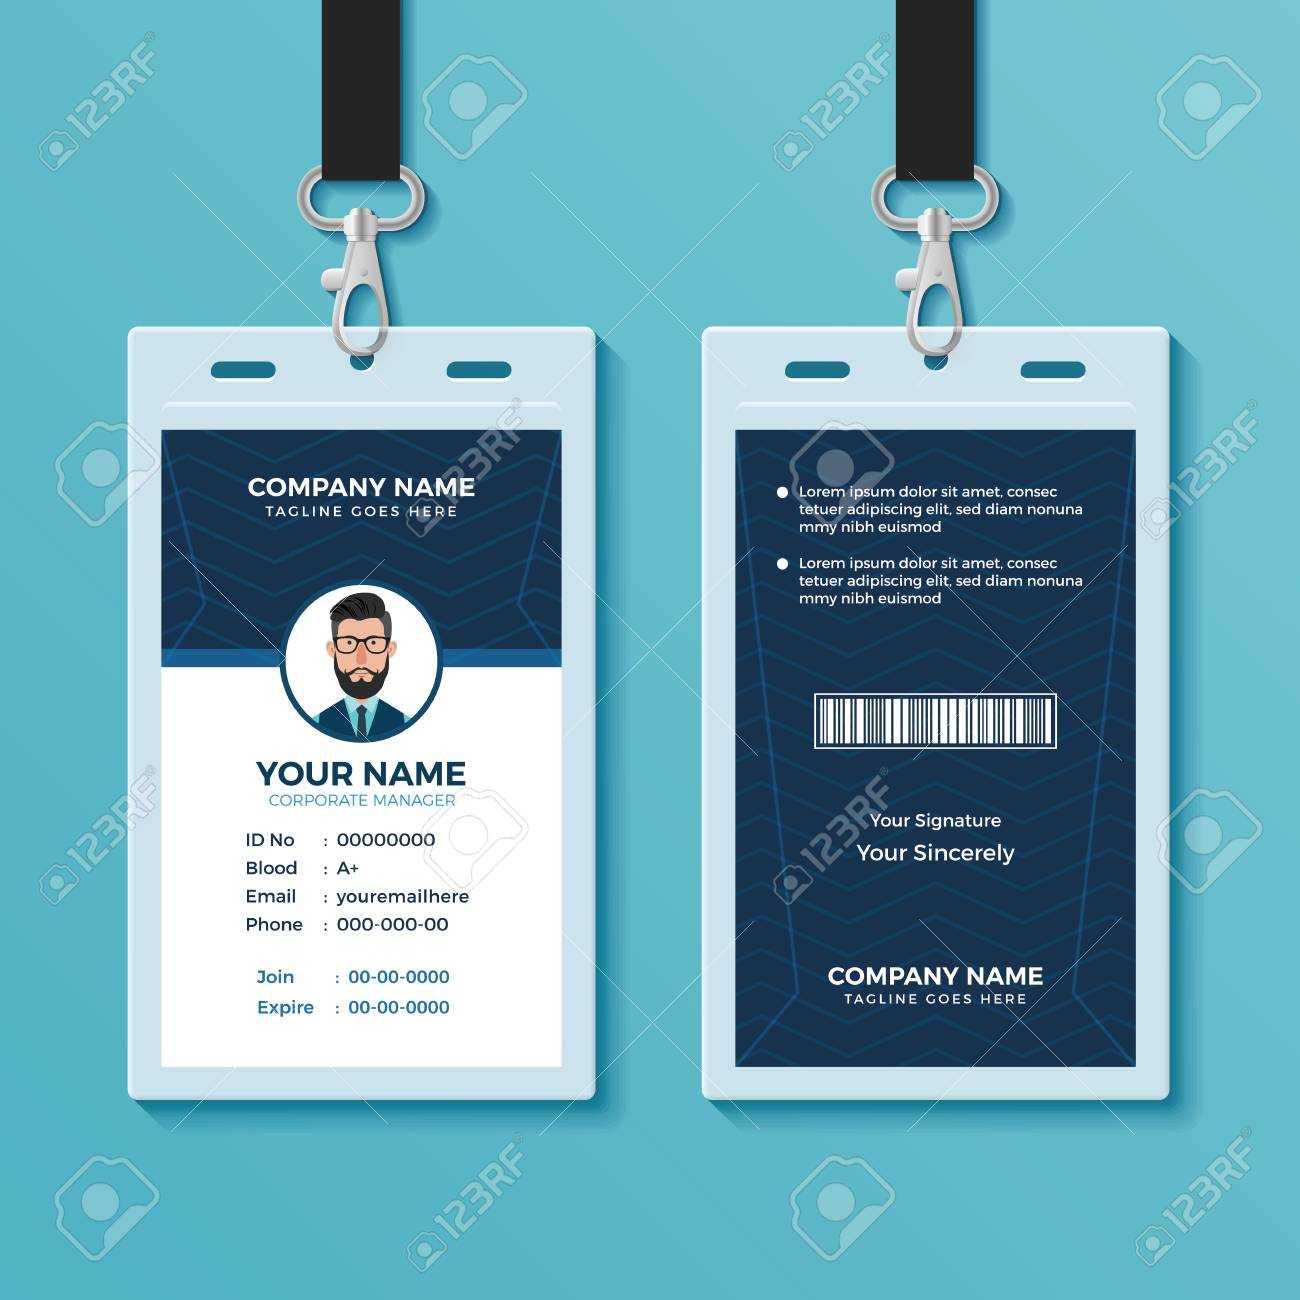 Modern And Clean Id Card Design Template Regarding Portrait Id Card Template